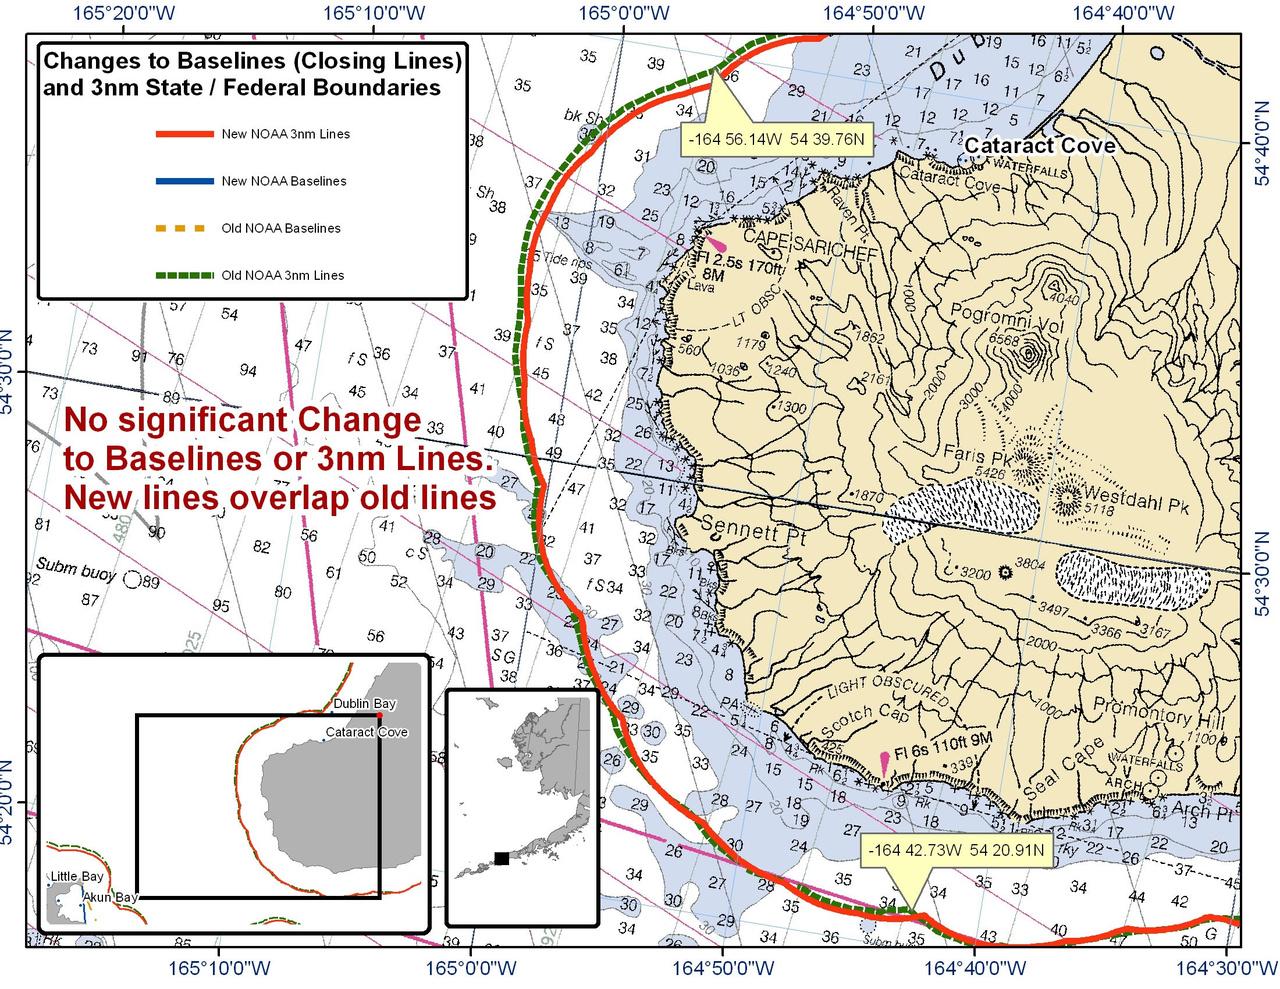 Chart for Cataract Cove